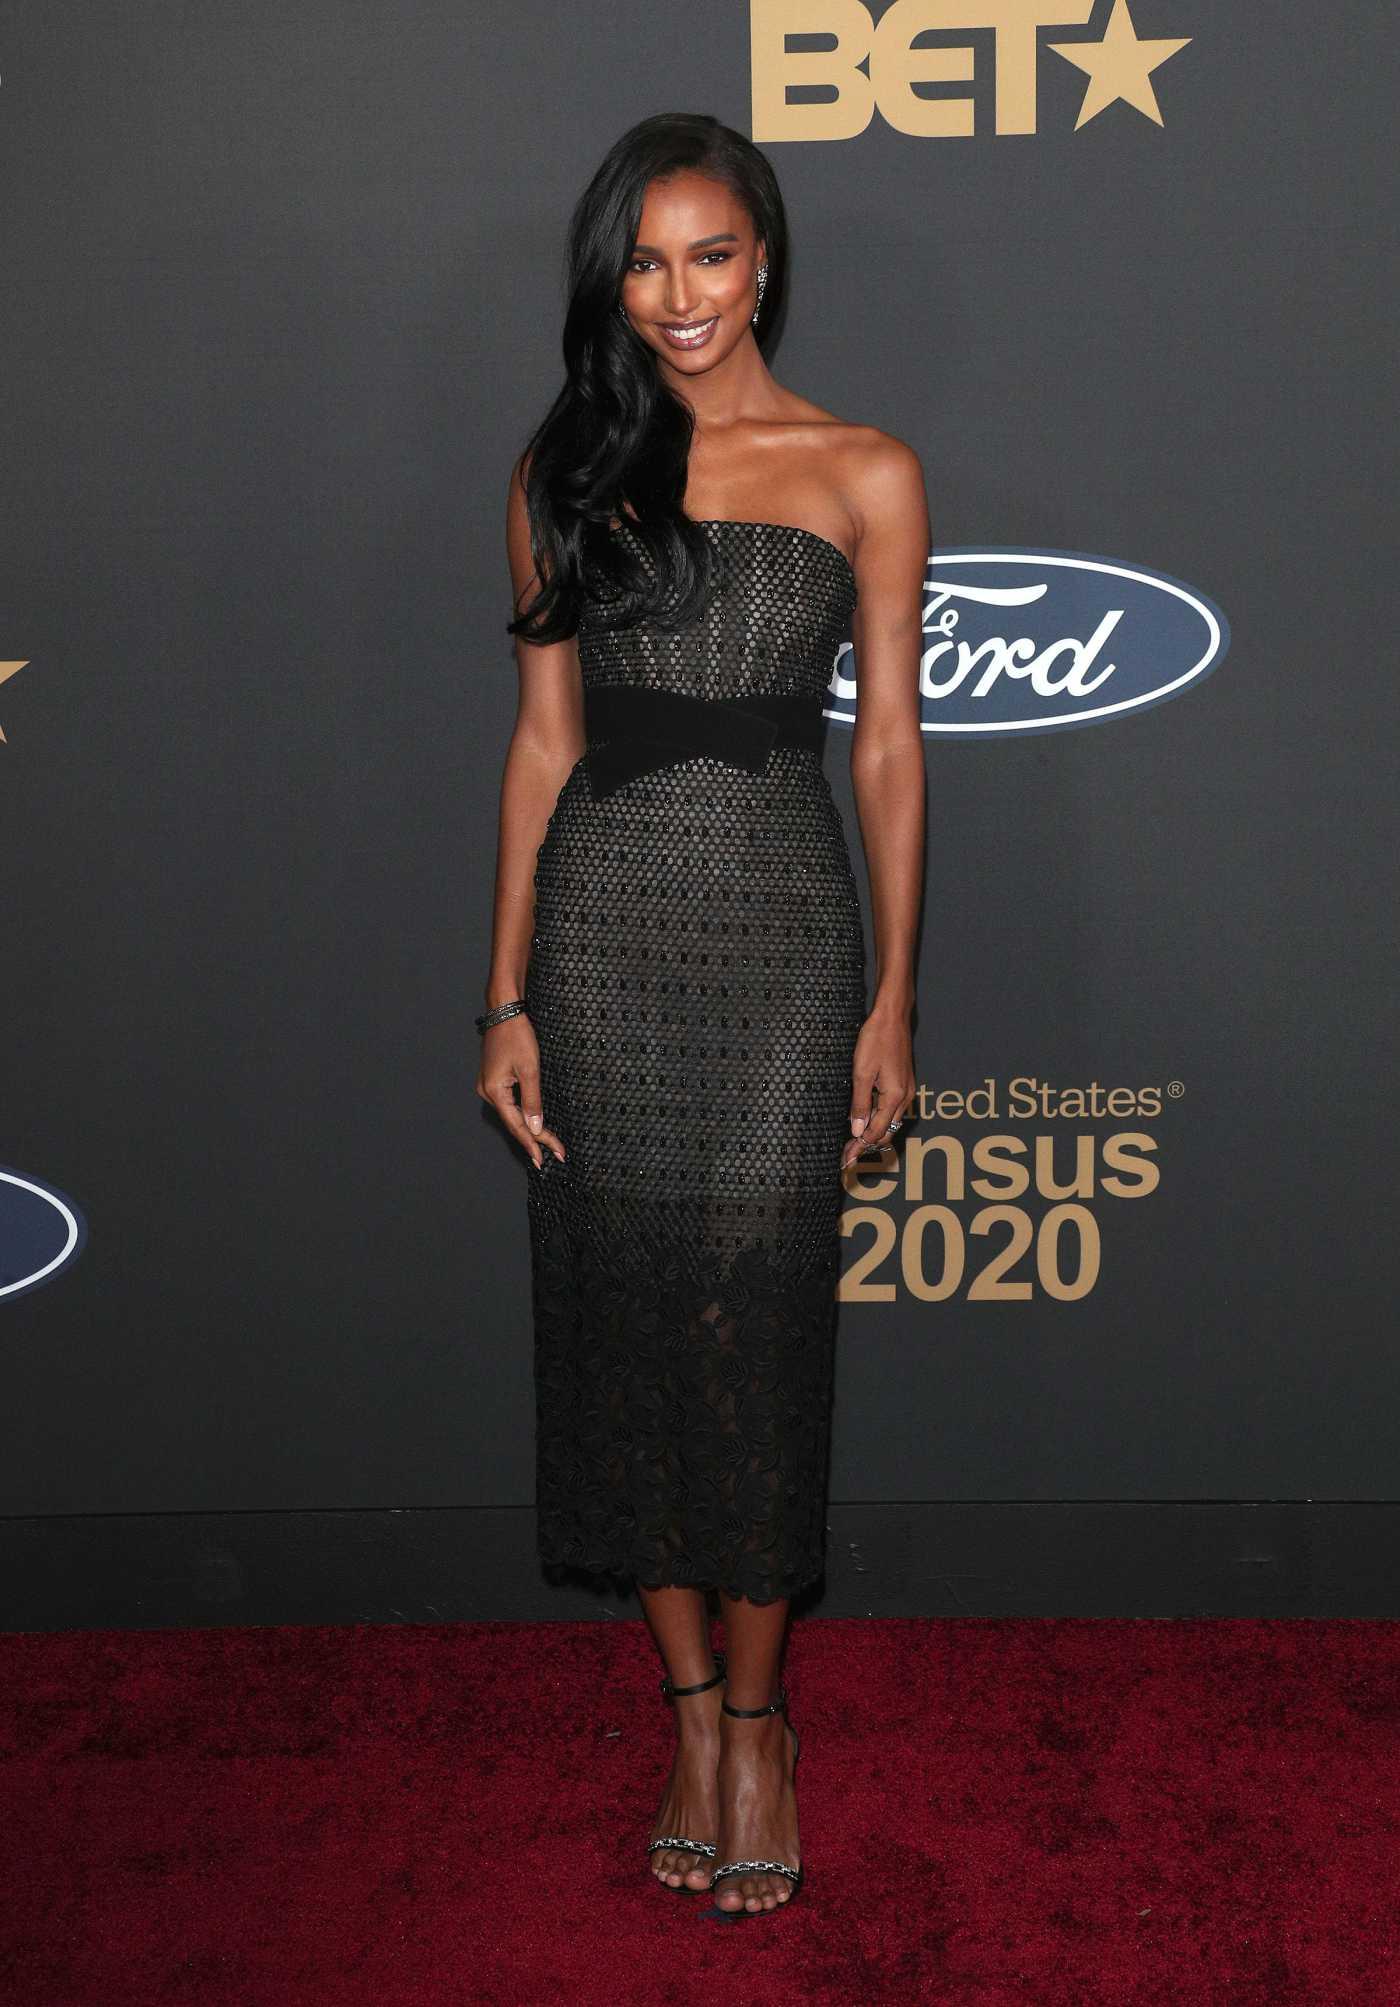 Jasmine Tookes Attends the 51st NAACP Image Awards at Pasadena Civic Auditorium in Pasadena 02/22/2020